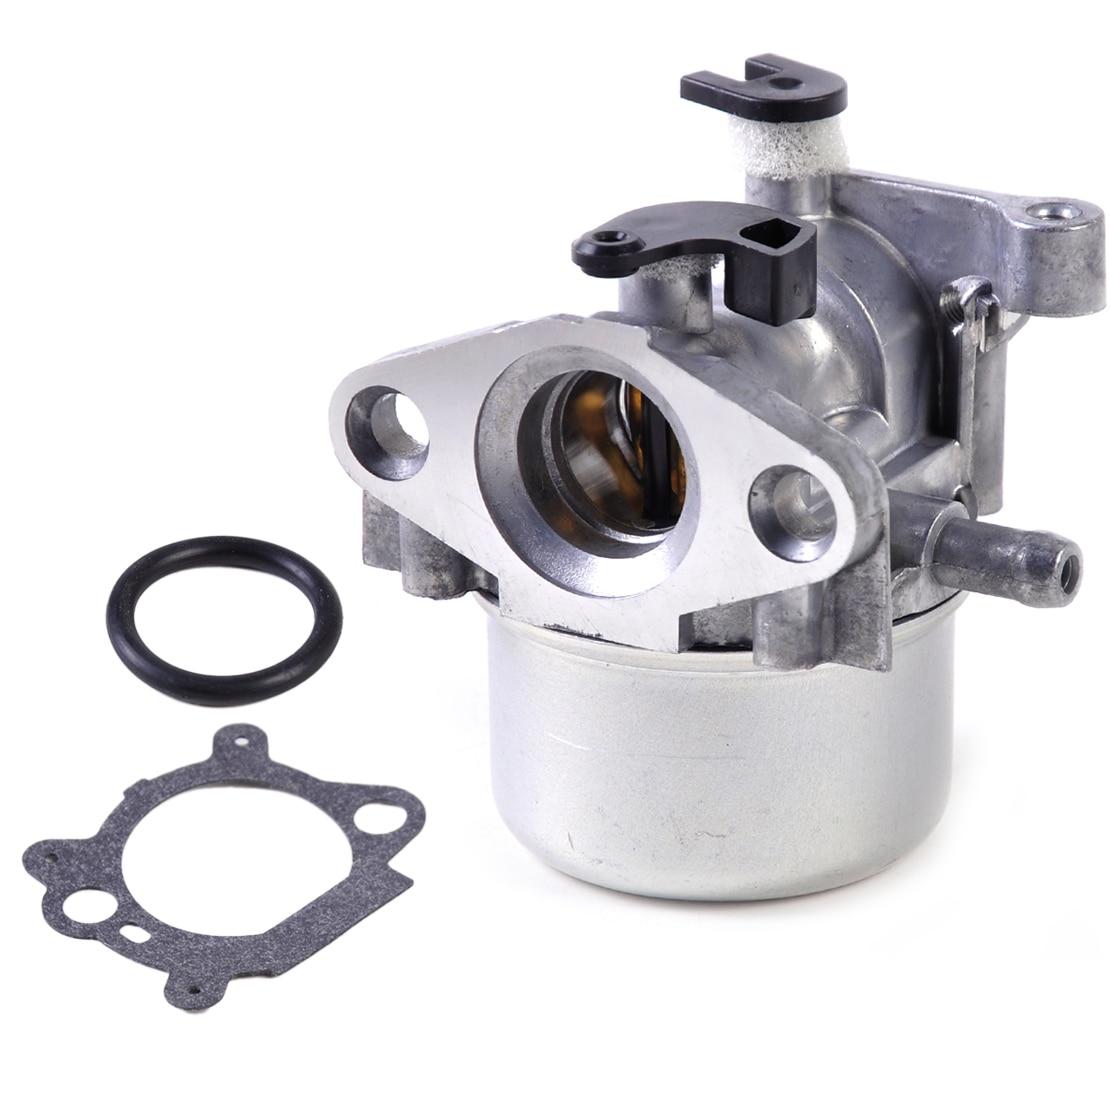 LETAOSK New Carburetor Fit For Briggs & Stratton Toro Craftsman Carb 799866 796707 794304 Replacement